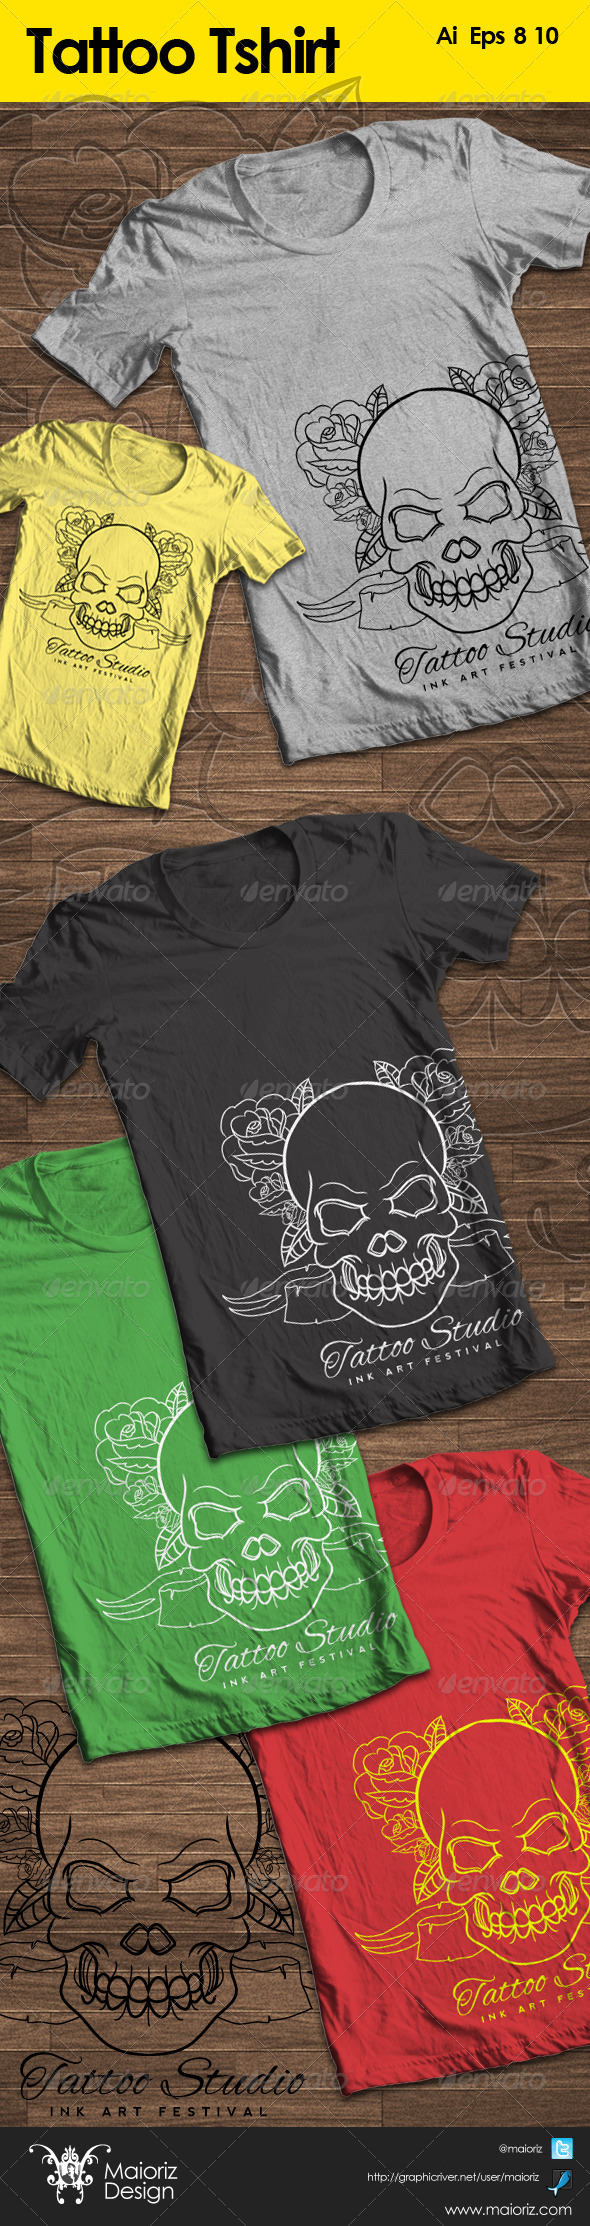 GraphicRiver Tattoo Tshirt Promote 5452652